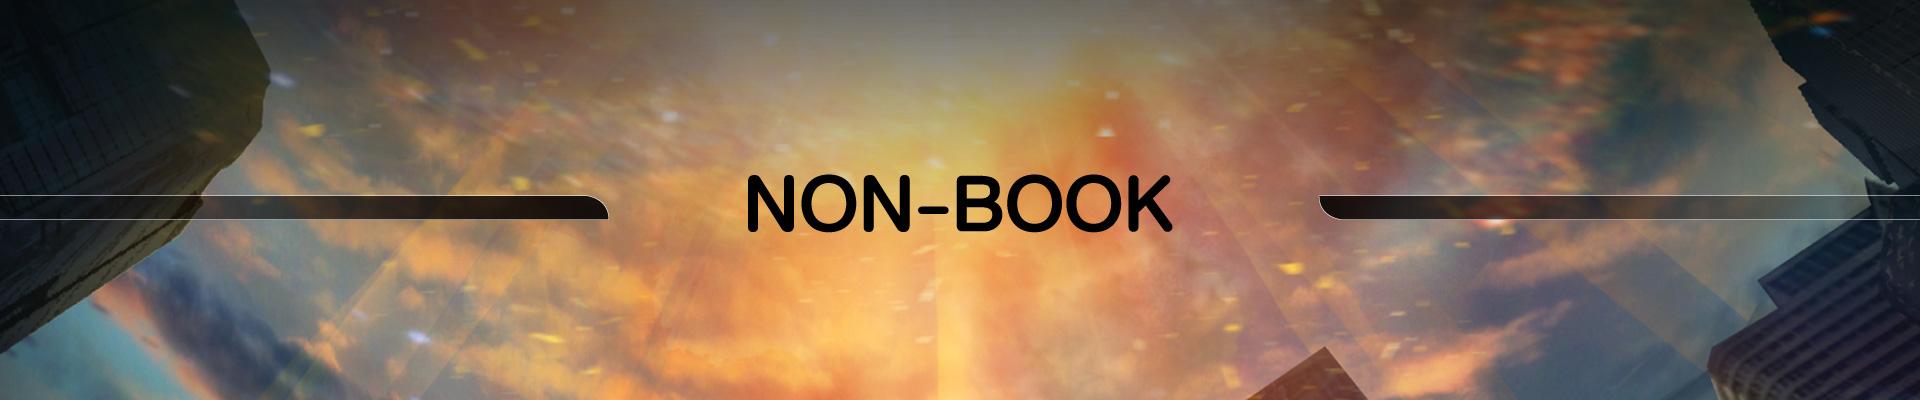 nonbook